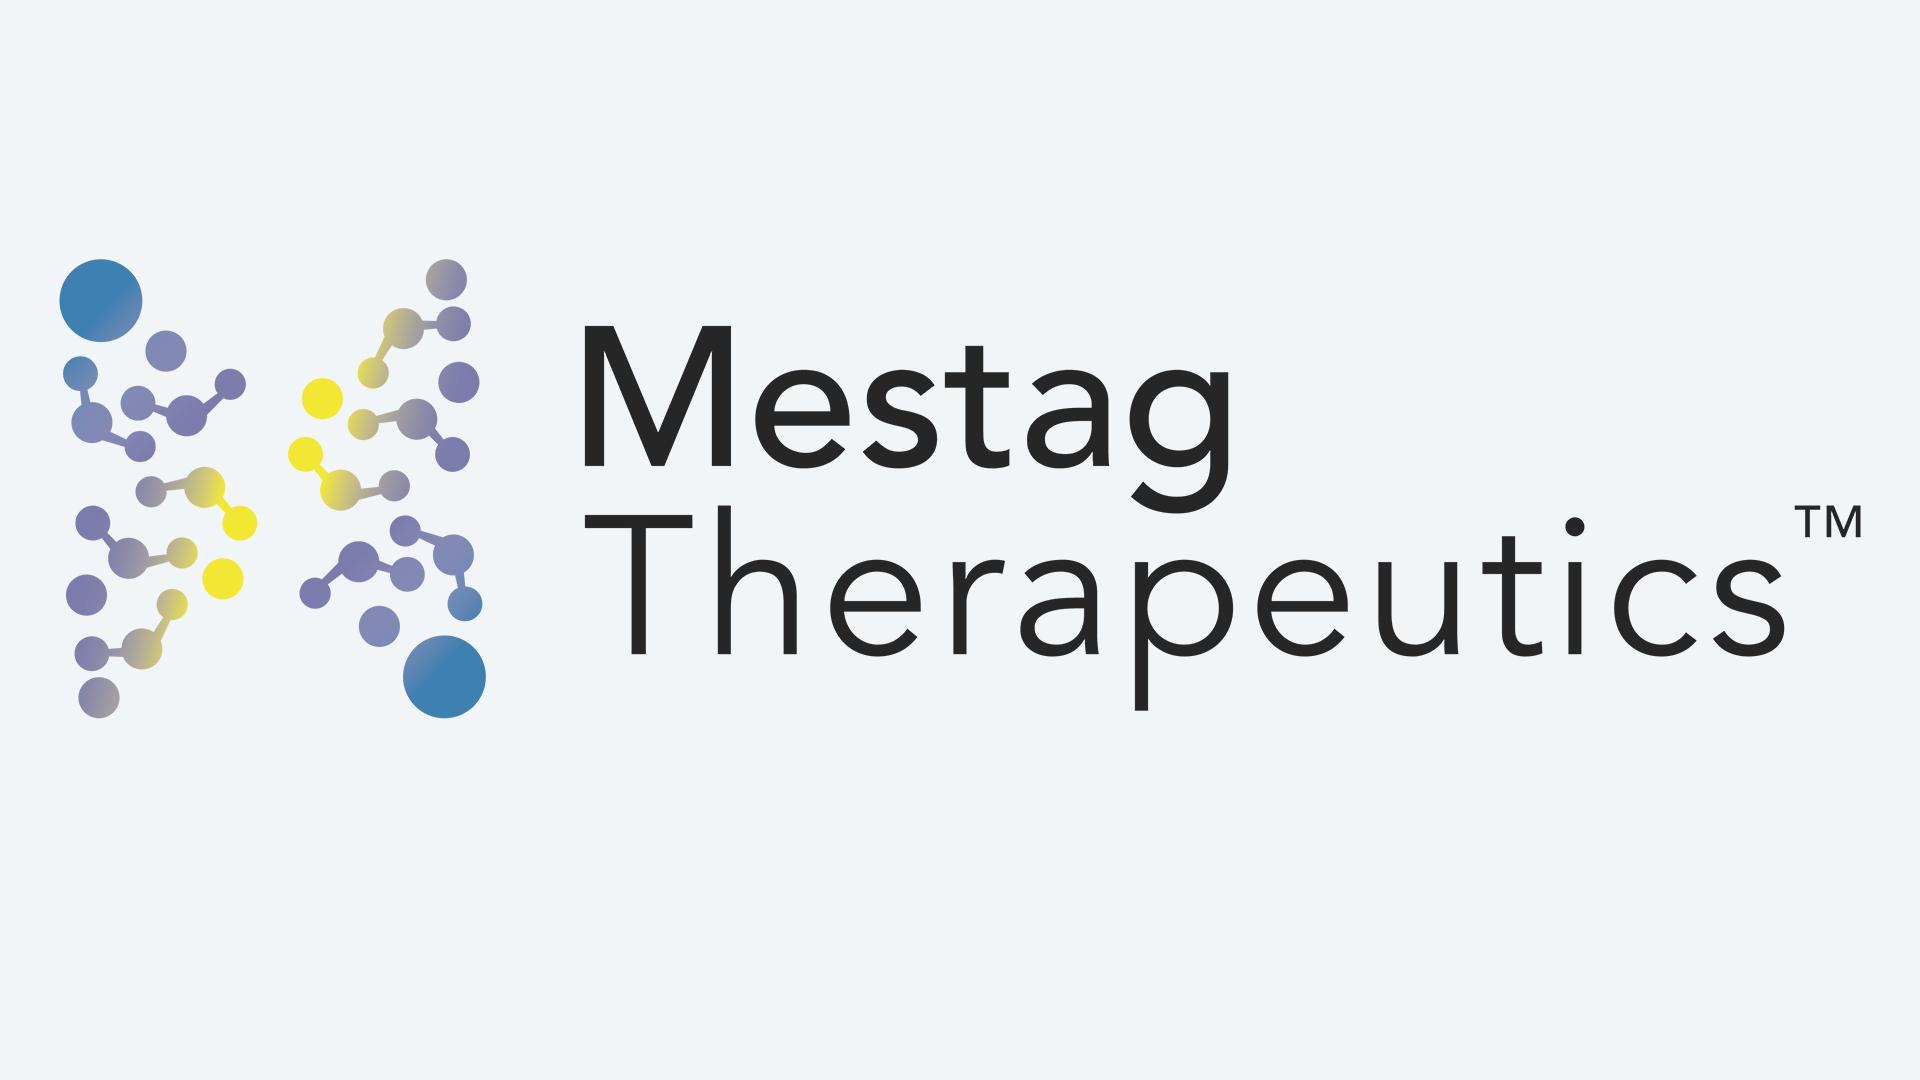 image of the Mestag Therapeutics™ logo